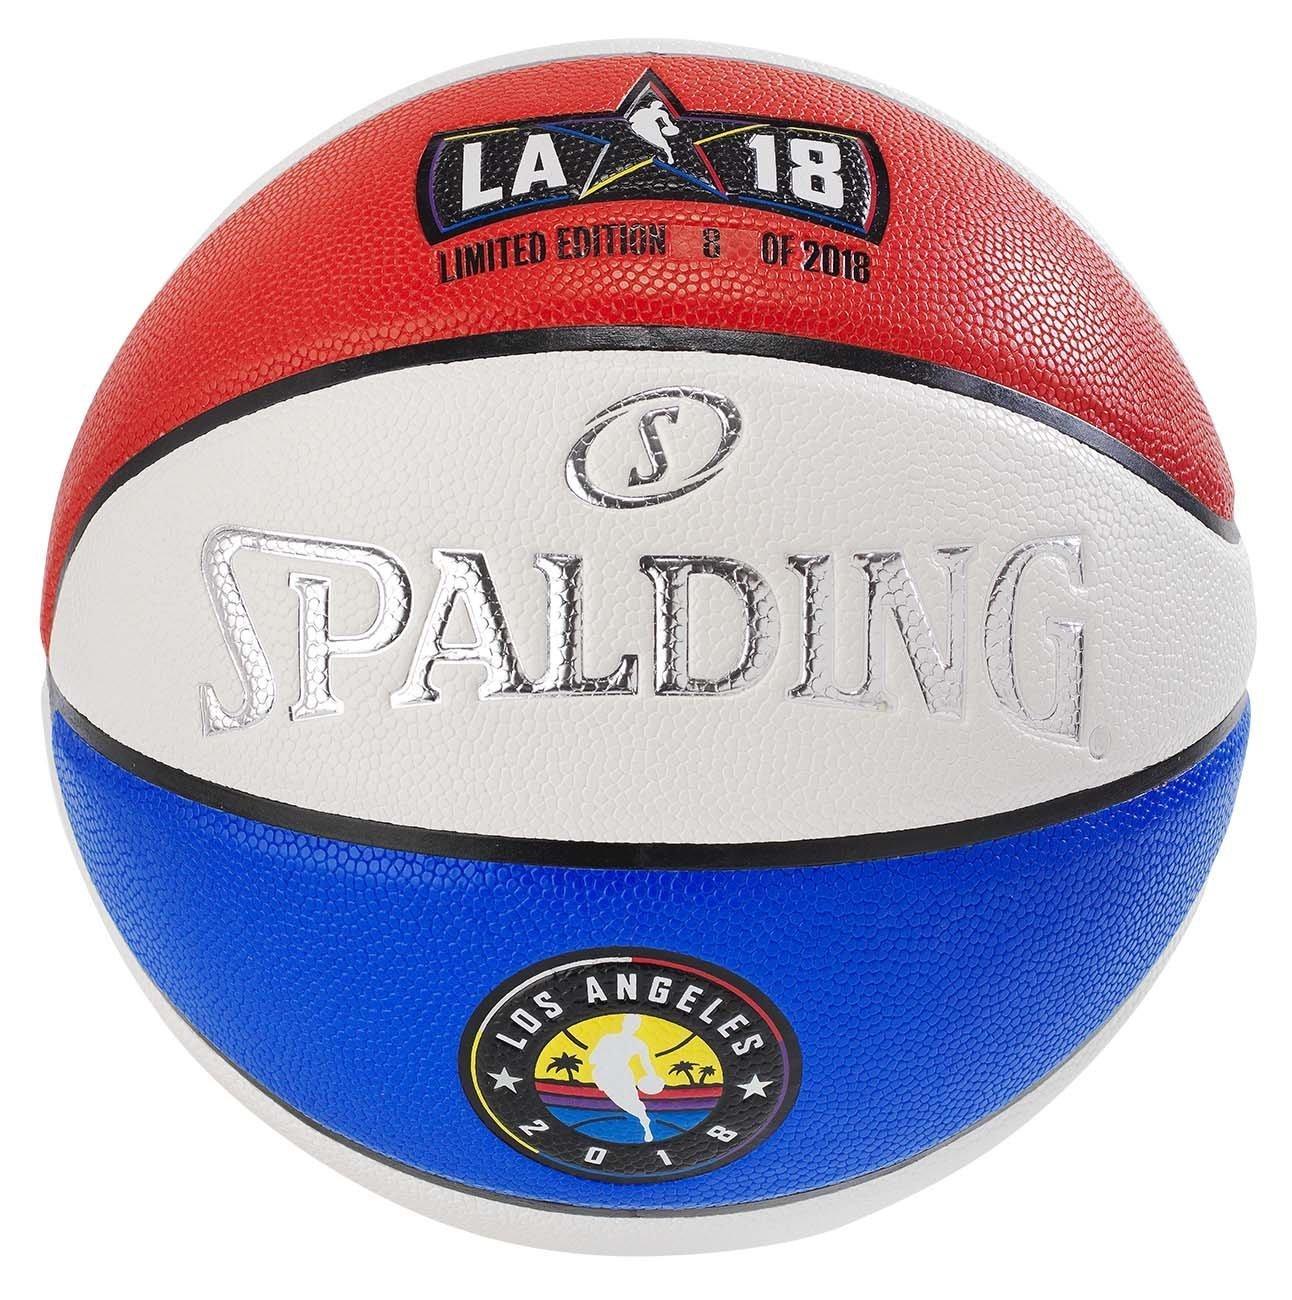 Spalding 2018 NBA All-Star Basketball